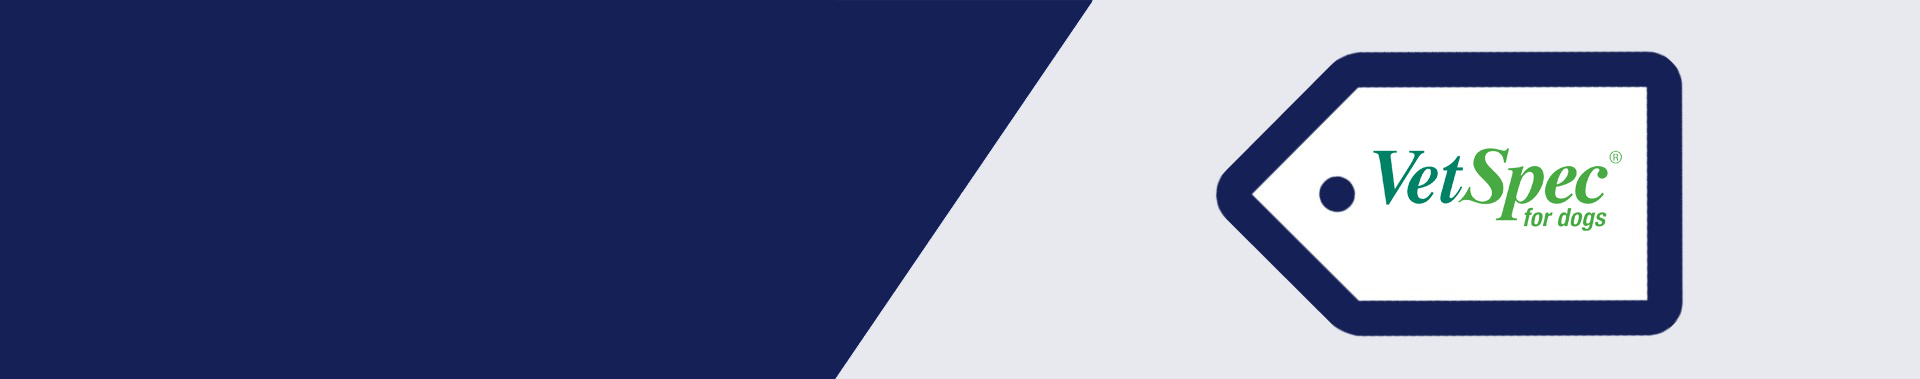 VetSpec